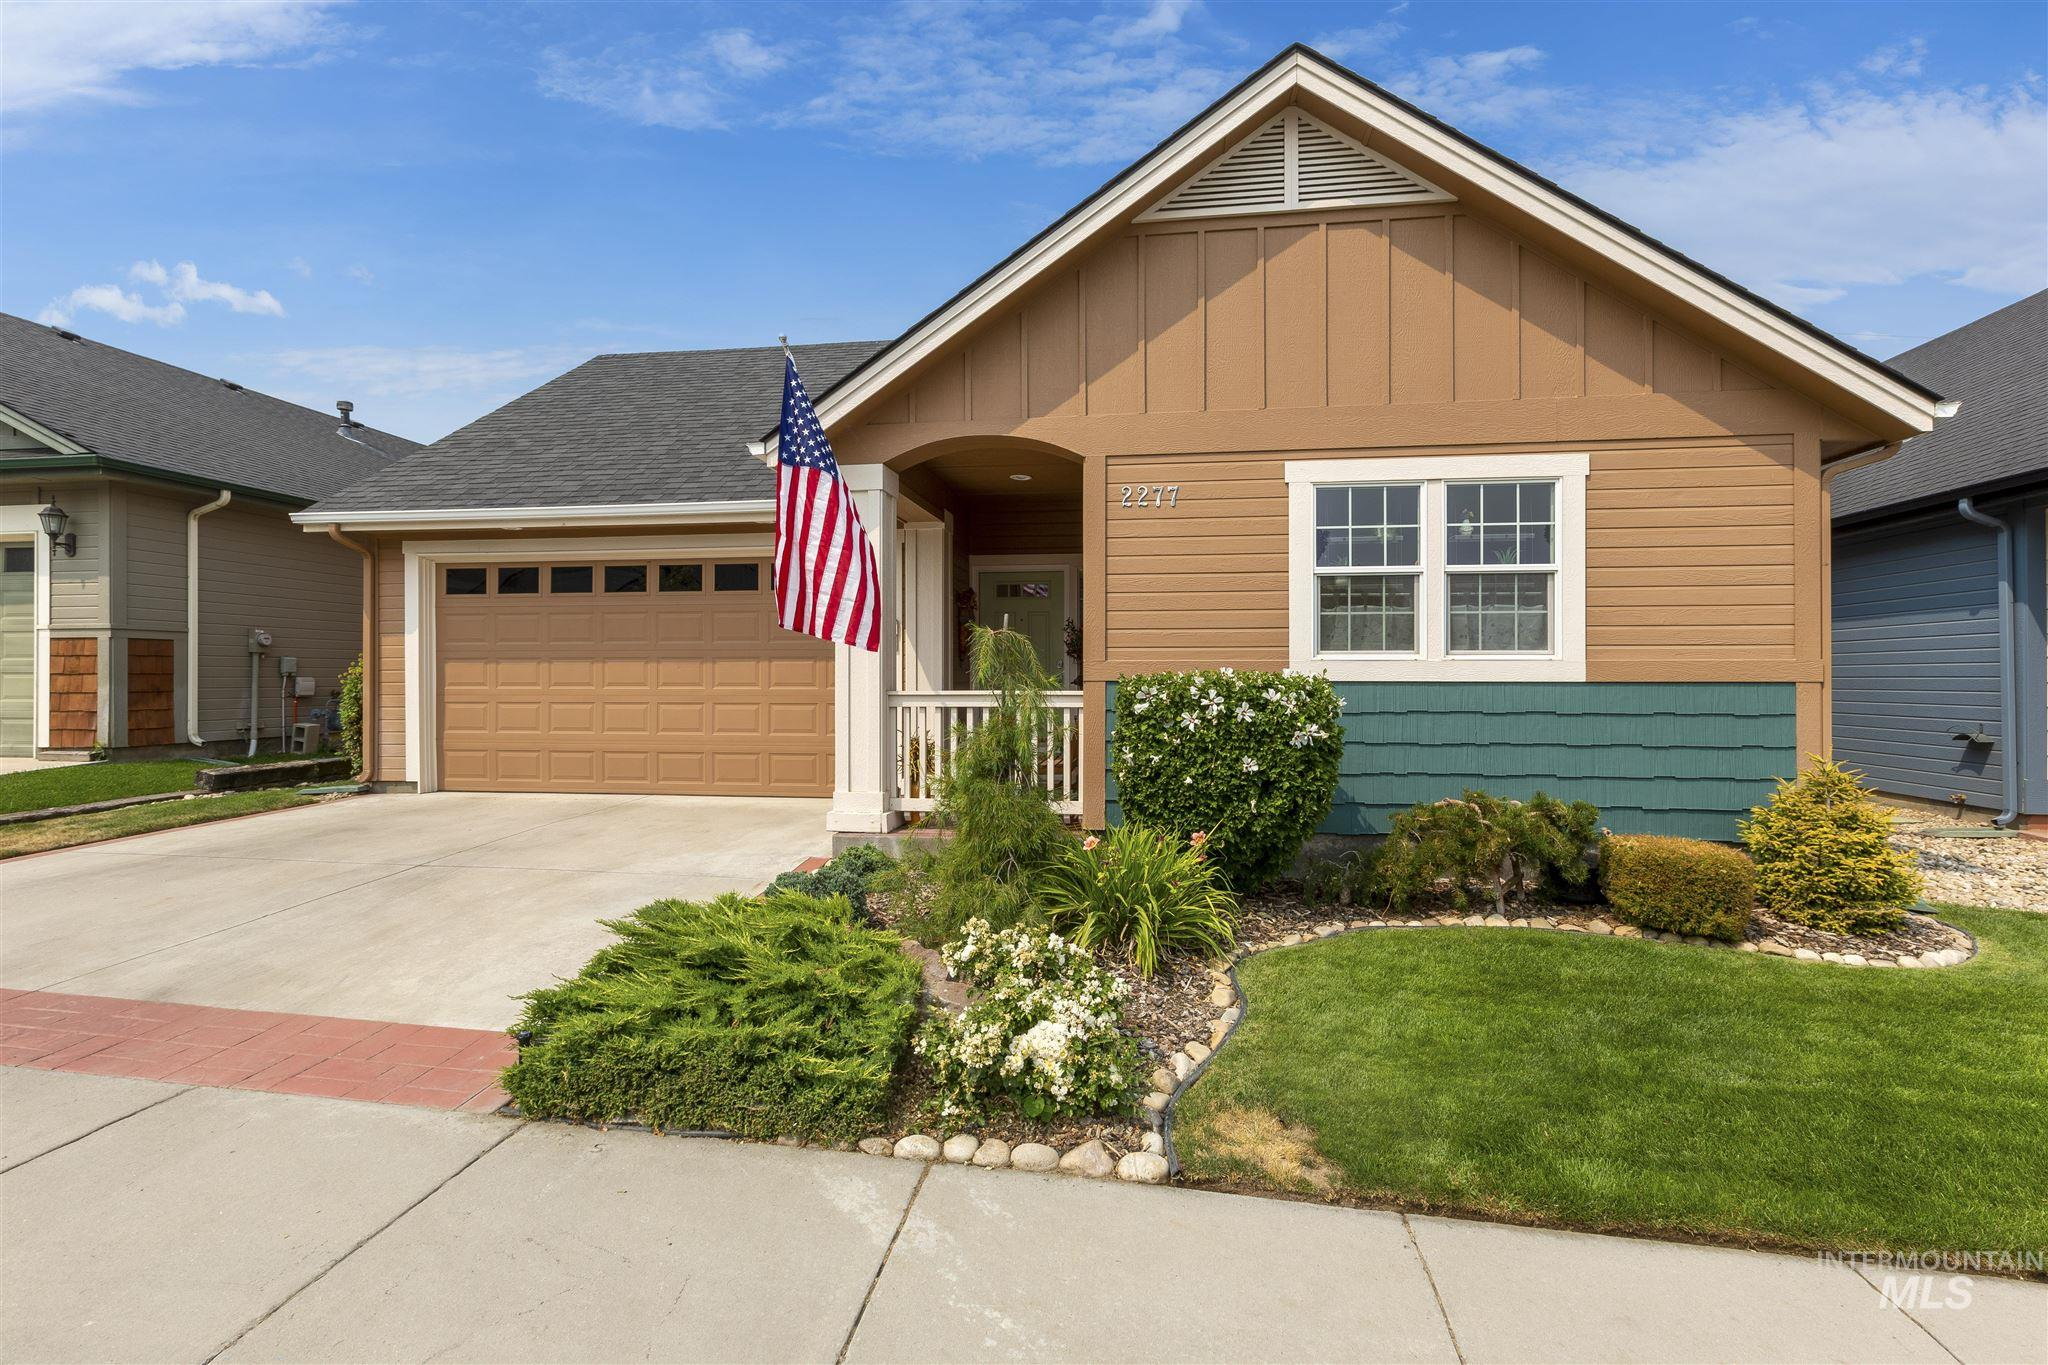 2277 N Eagle Creek Dr, Eagle, ID 83616